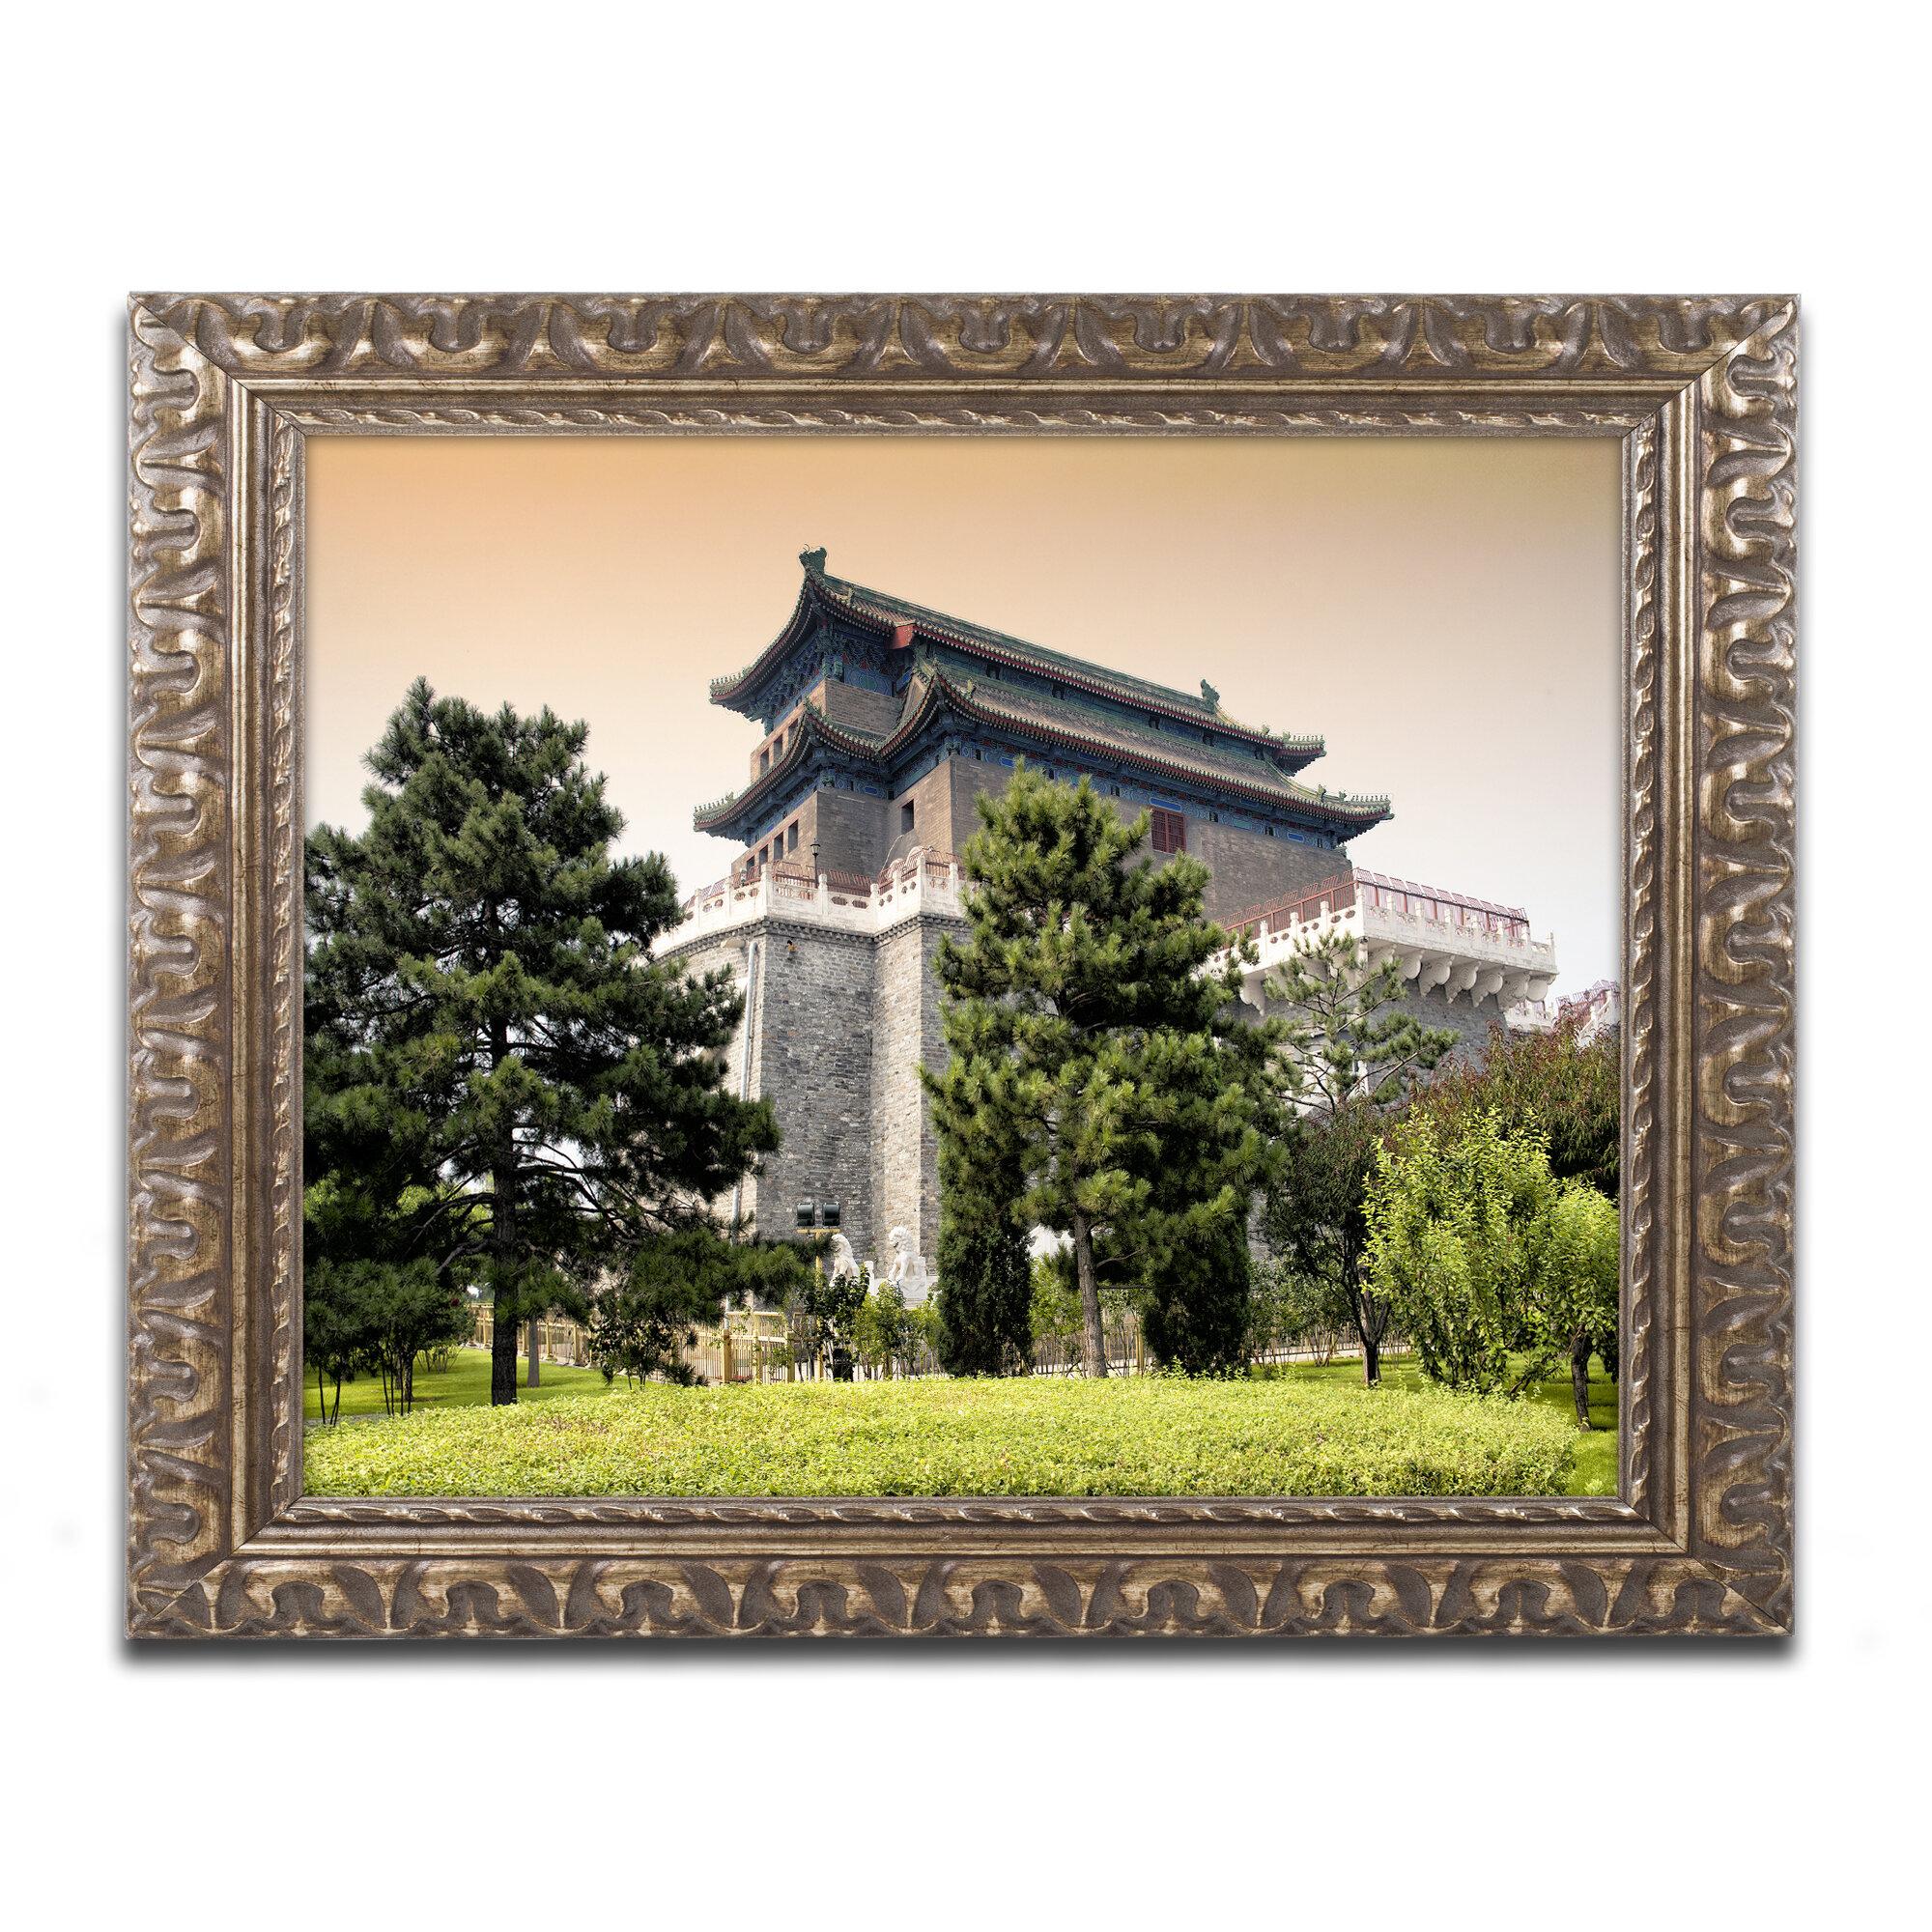 Trademark Art Temple By Philippe Hugonnard Framed Photographic Print Wayfair